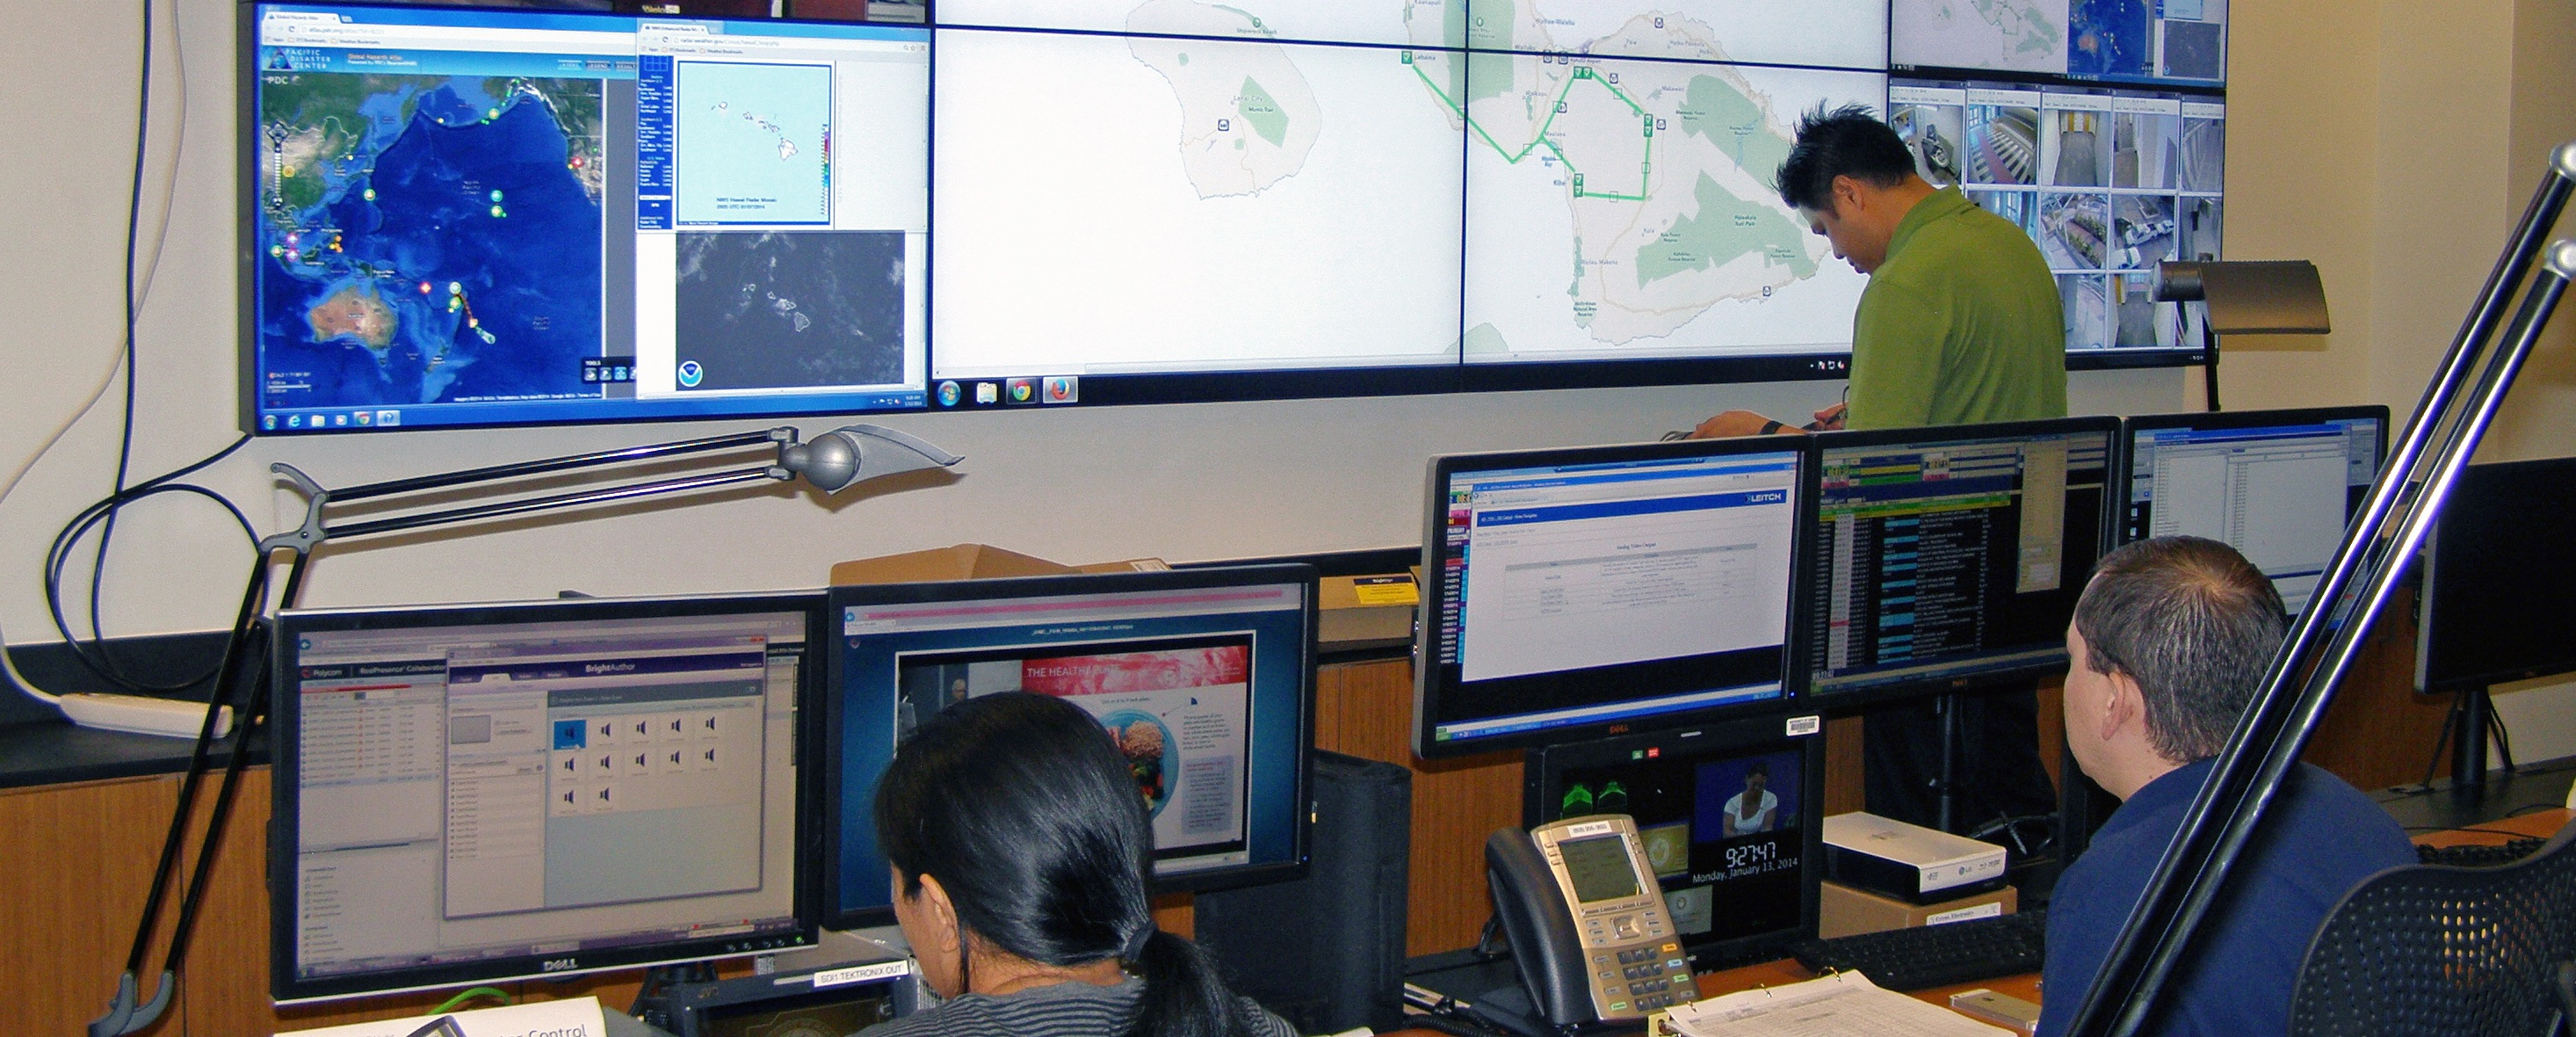 Staff in IT Center